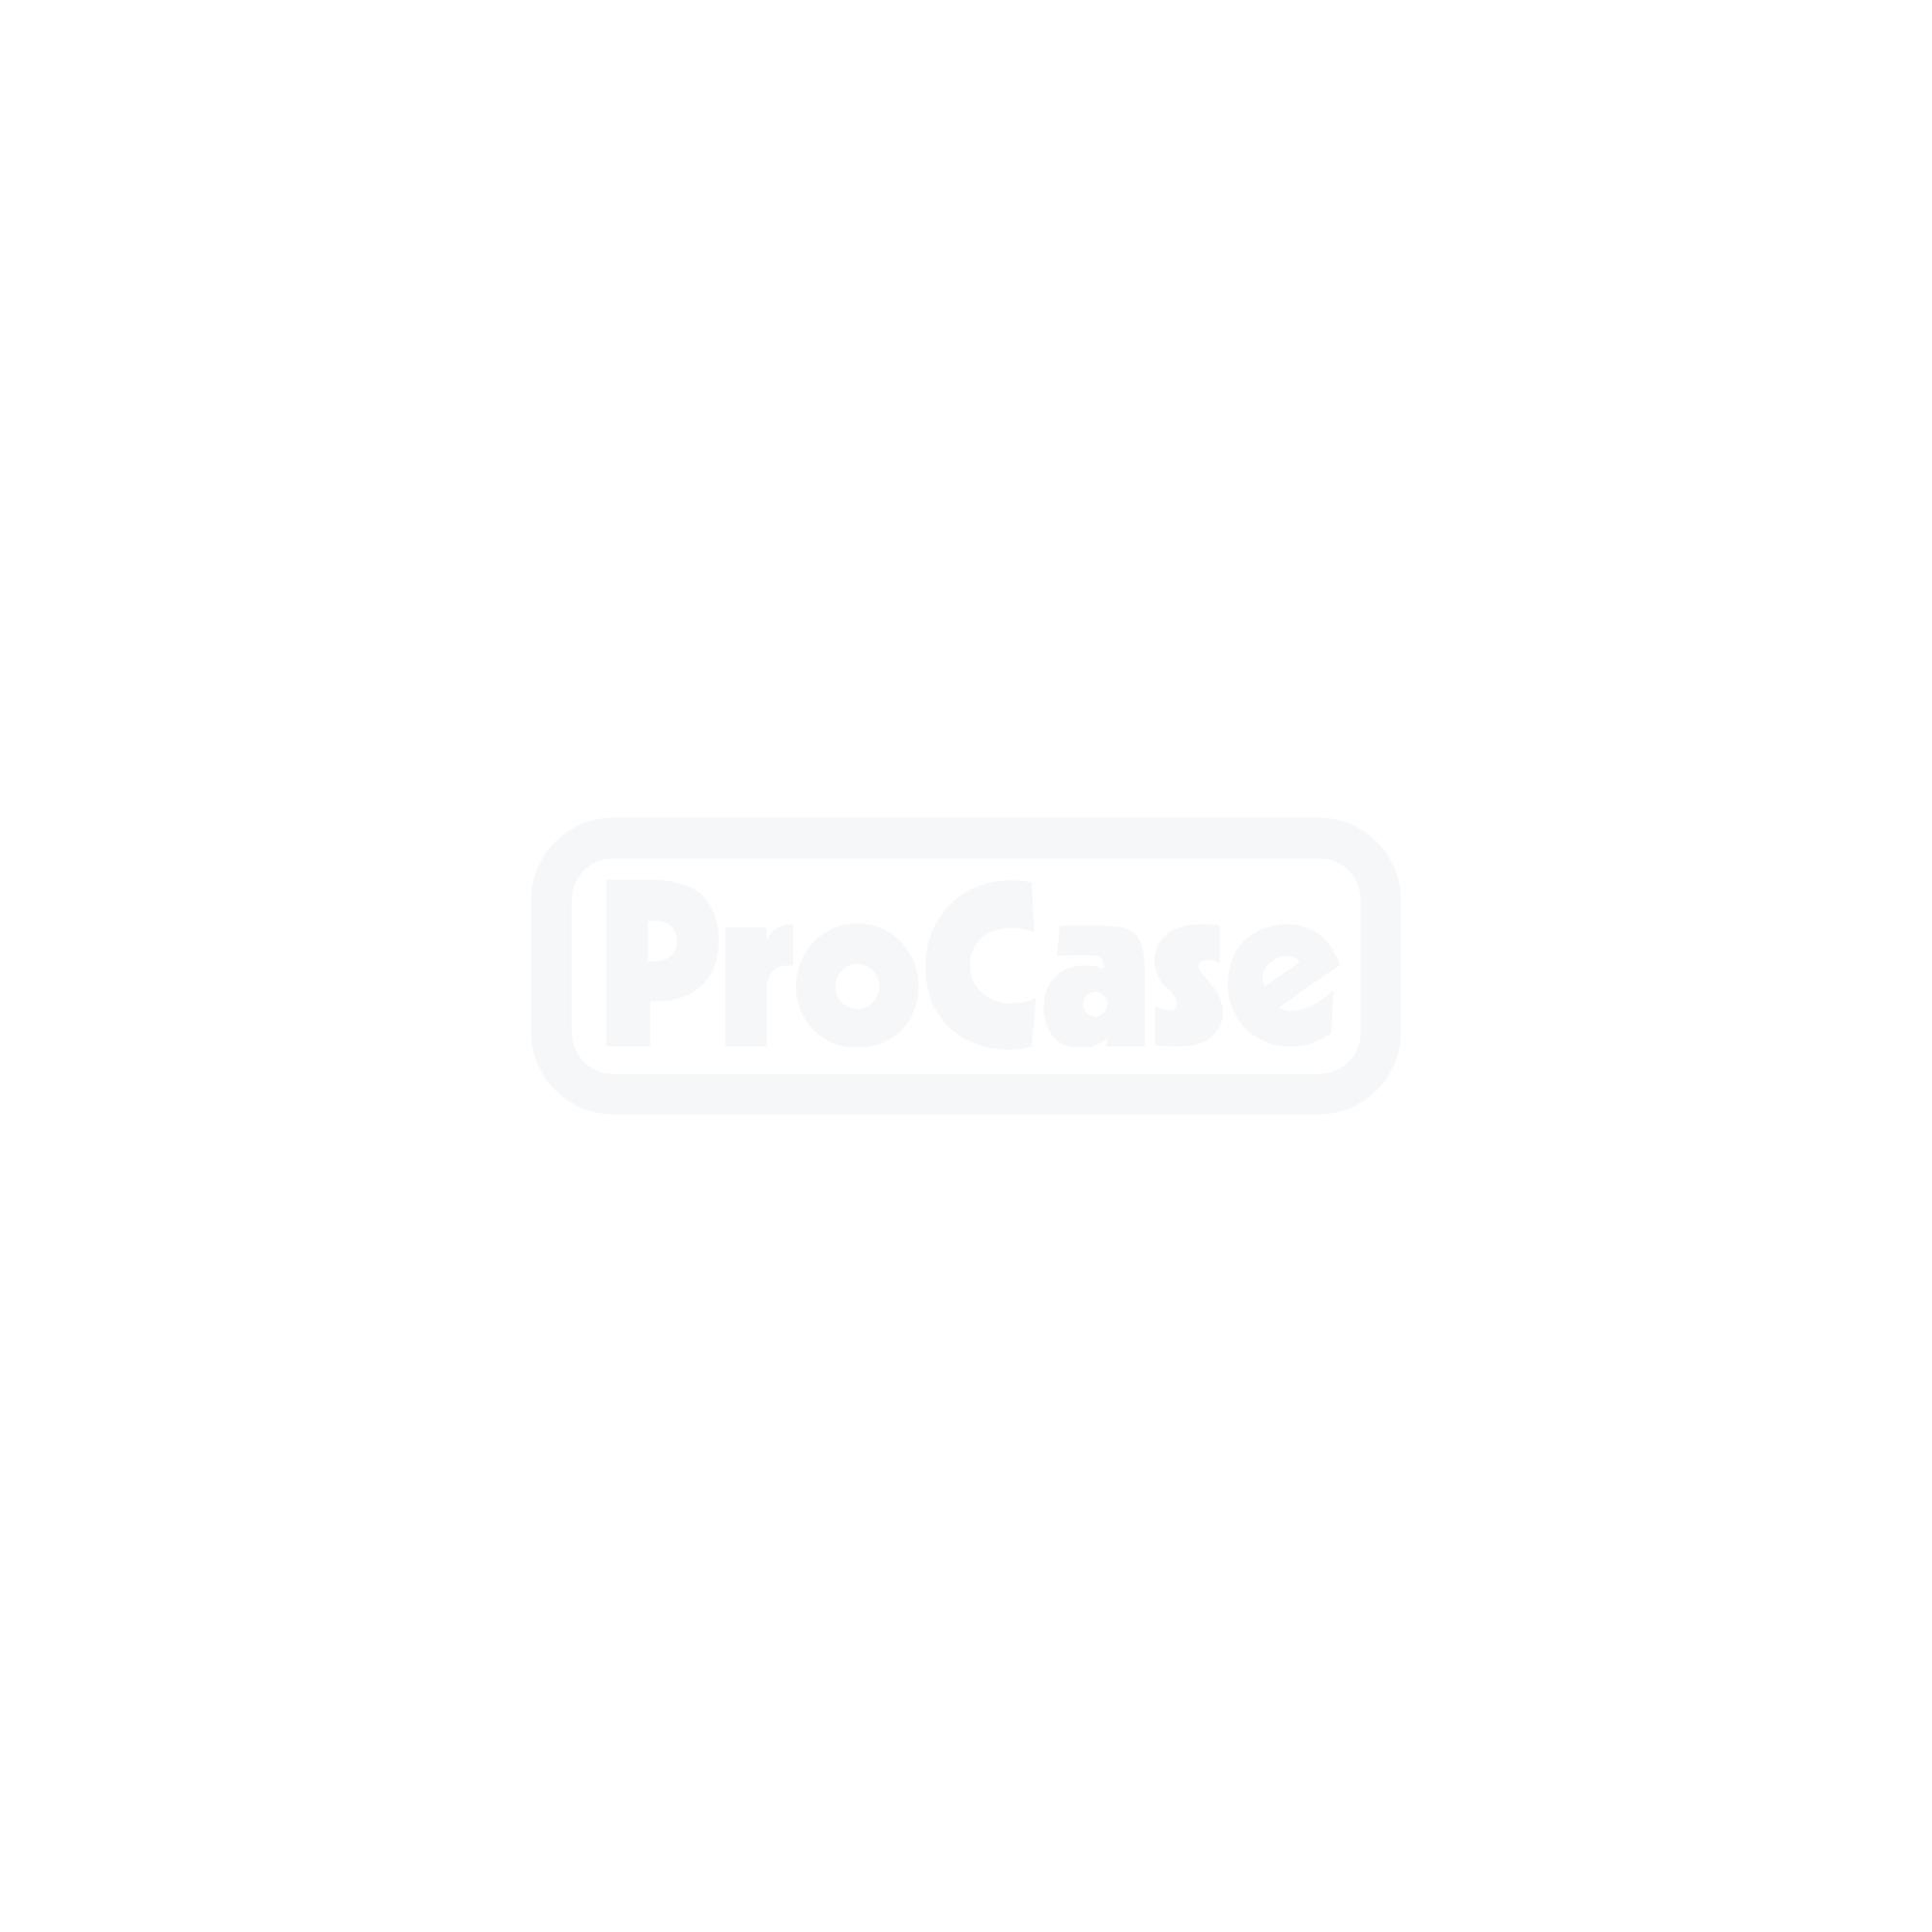 Flightcase für Sanyo PLC-HF15000 mit Pegasus Flugrahmen 2